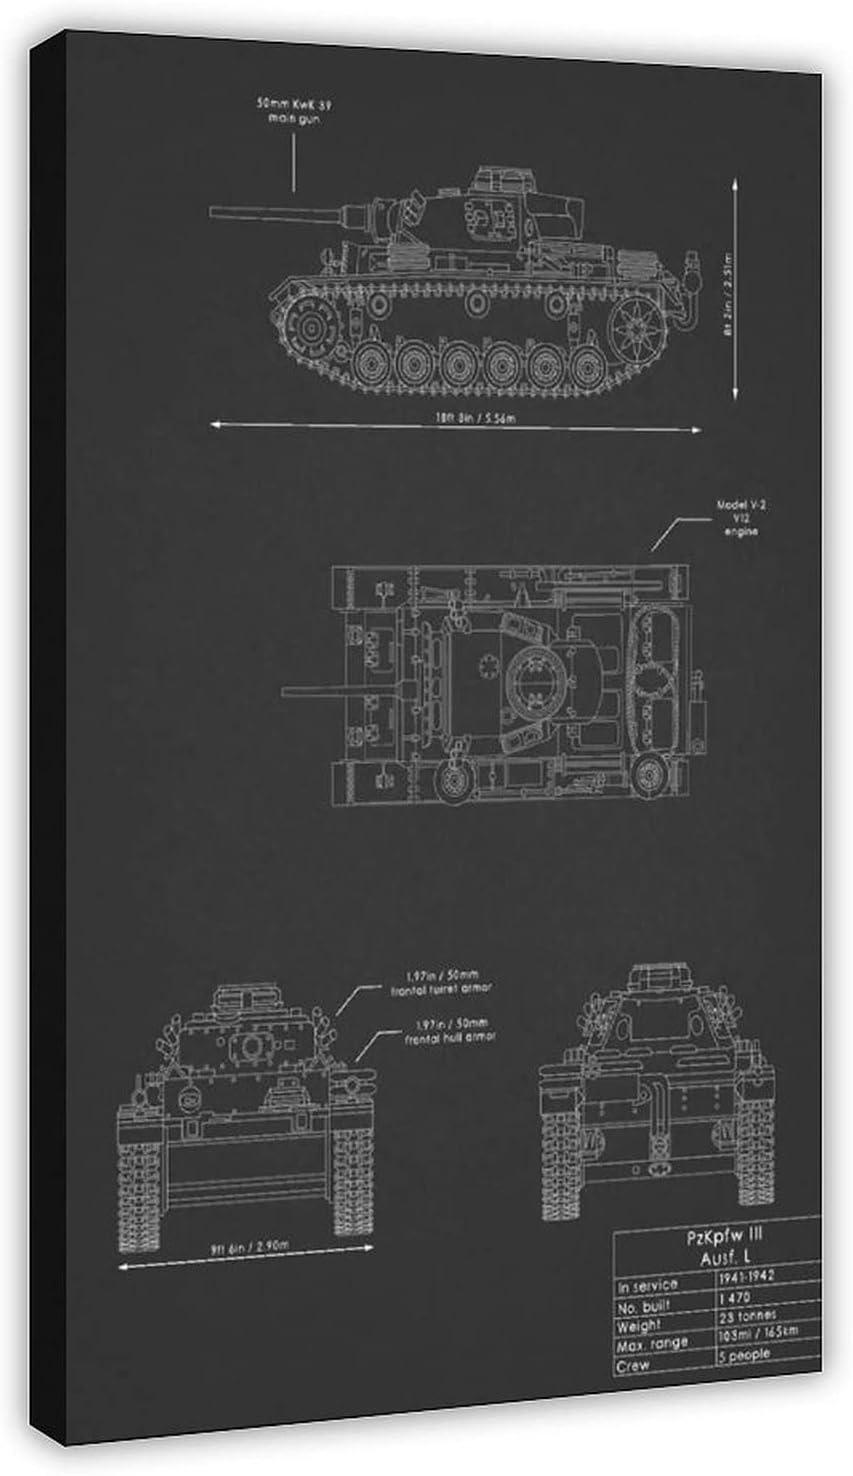 Blueprints for Weapons of War III PzKpfw Canvas Blackboard 5 ☆ very popular Tanks Oklahoma City Mall